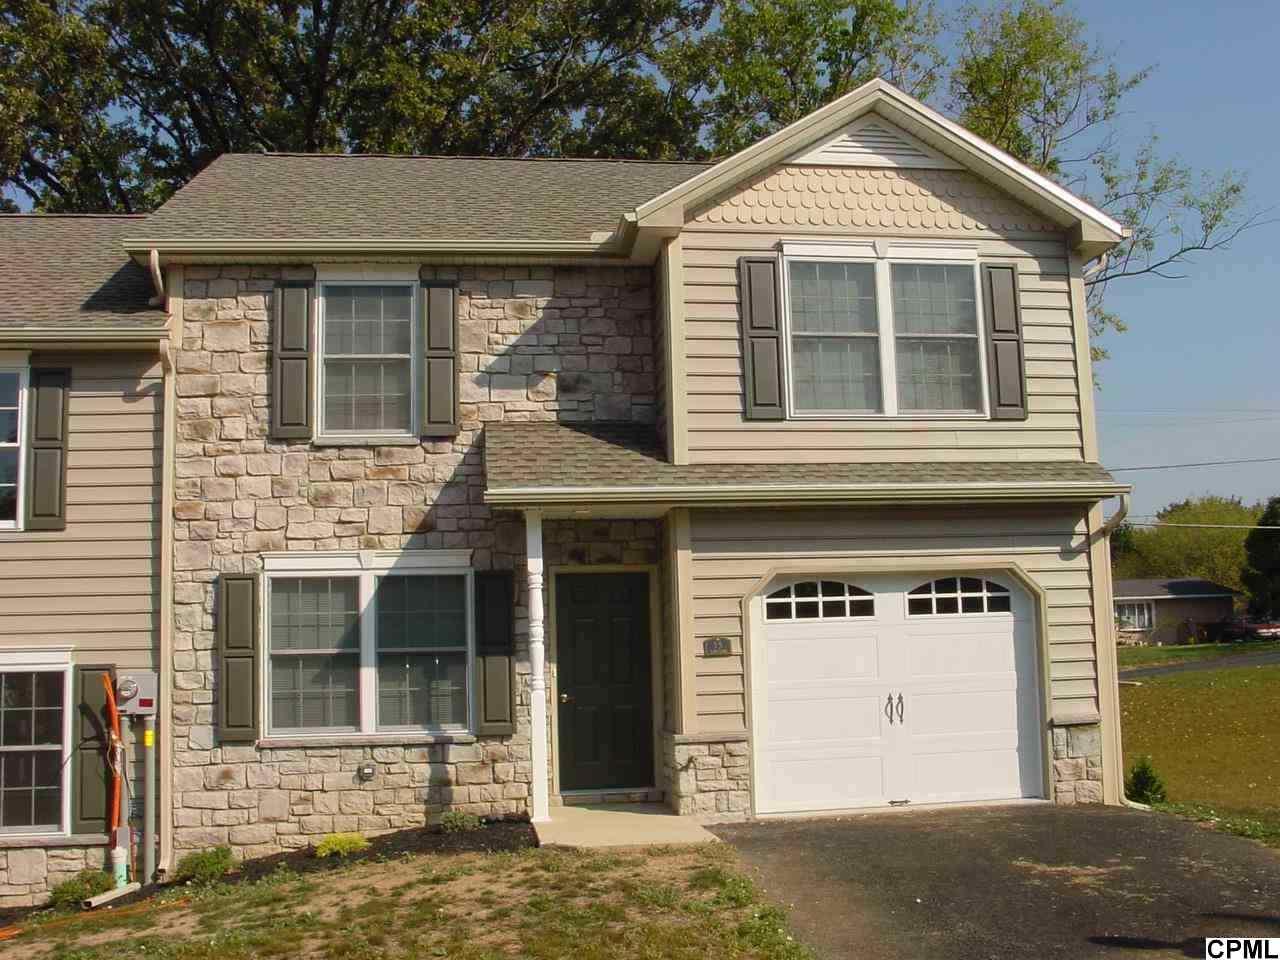 Rental Homes for Rent, ListingId:31279142, location: 15 Luke Lane Carlisle 17015